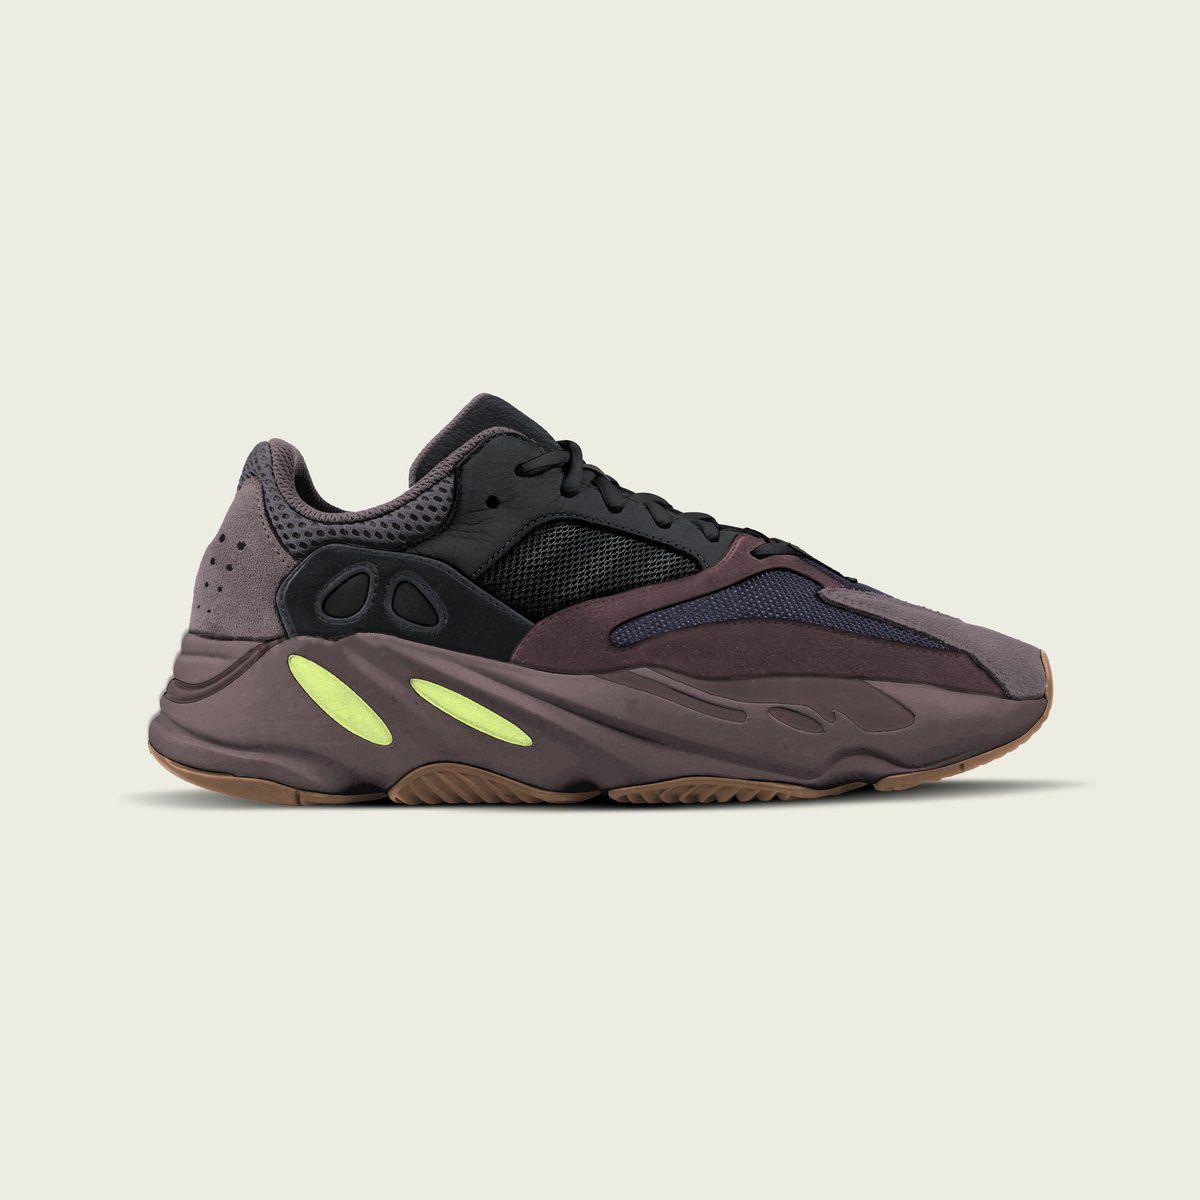 online retailer 45e56 b5663 Yeezy 700 | Fringues en 2019 | Yeezy, Chaussure et Chaussure ...